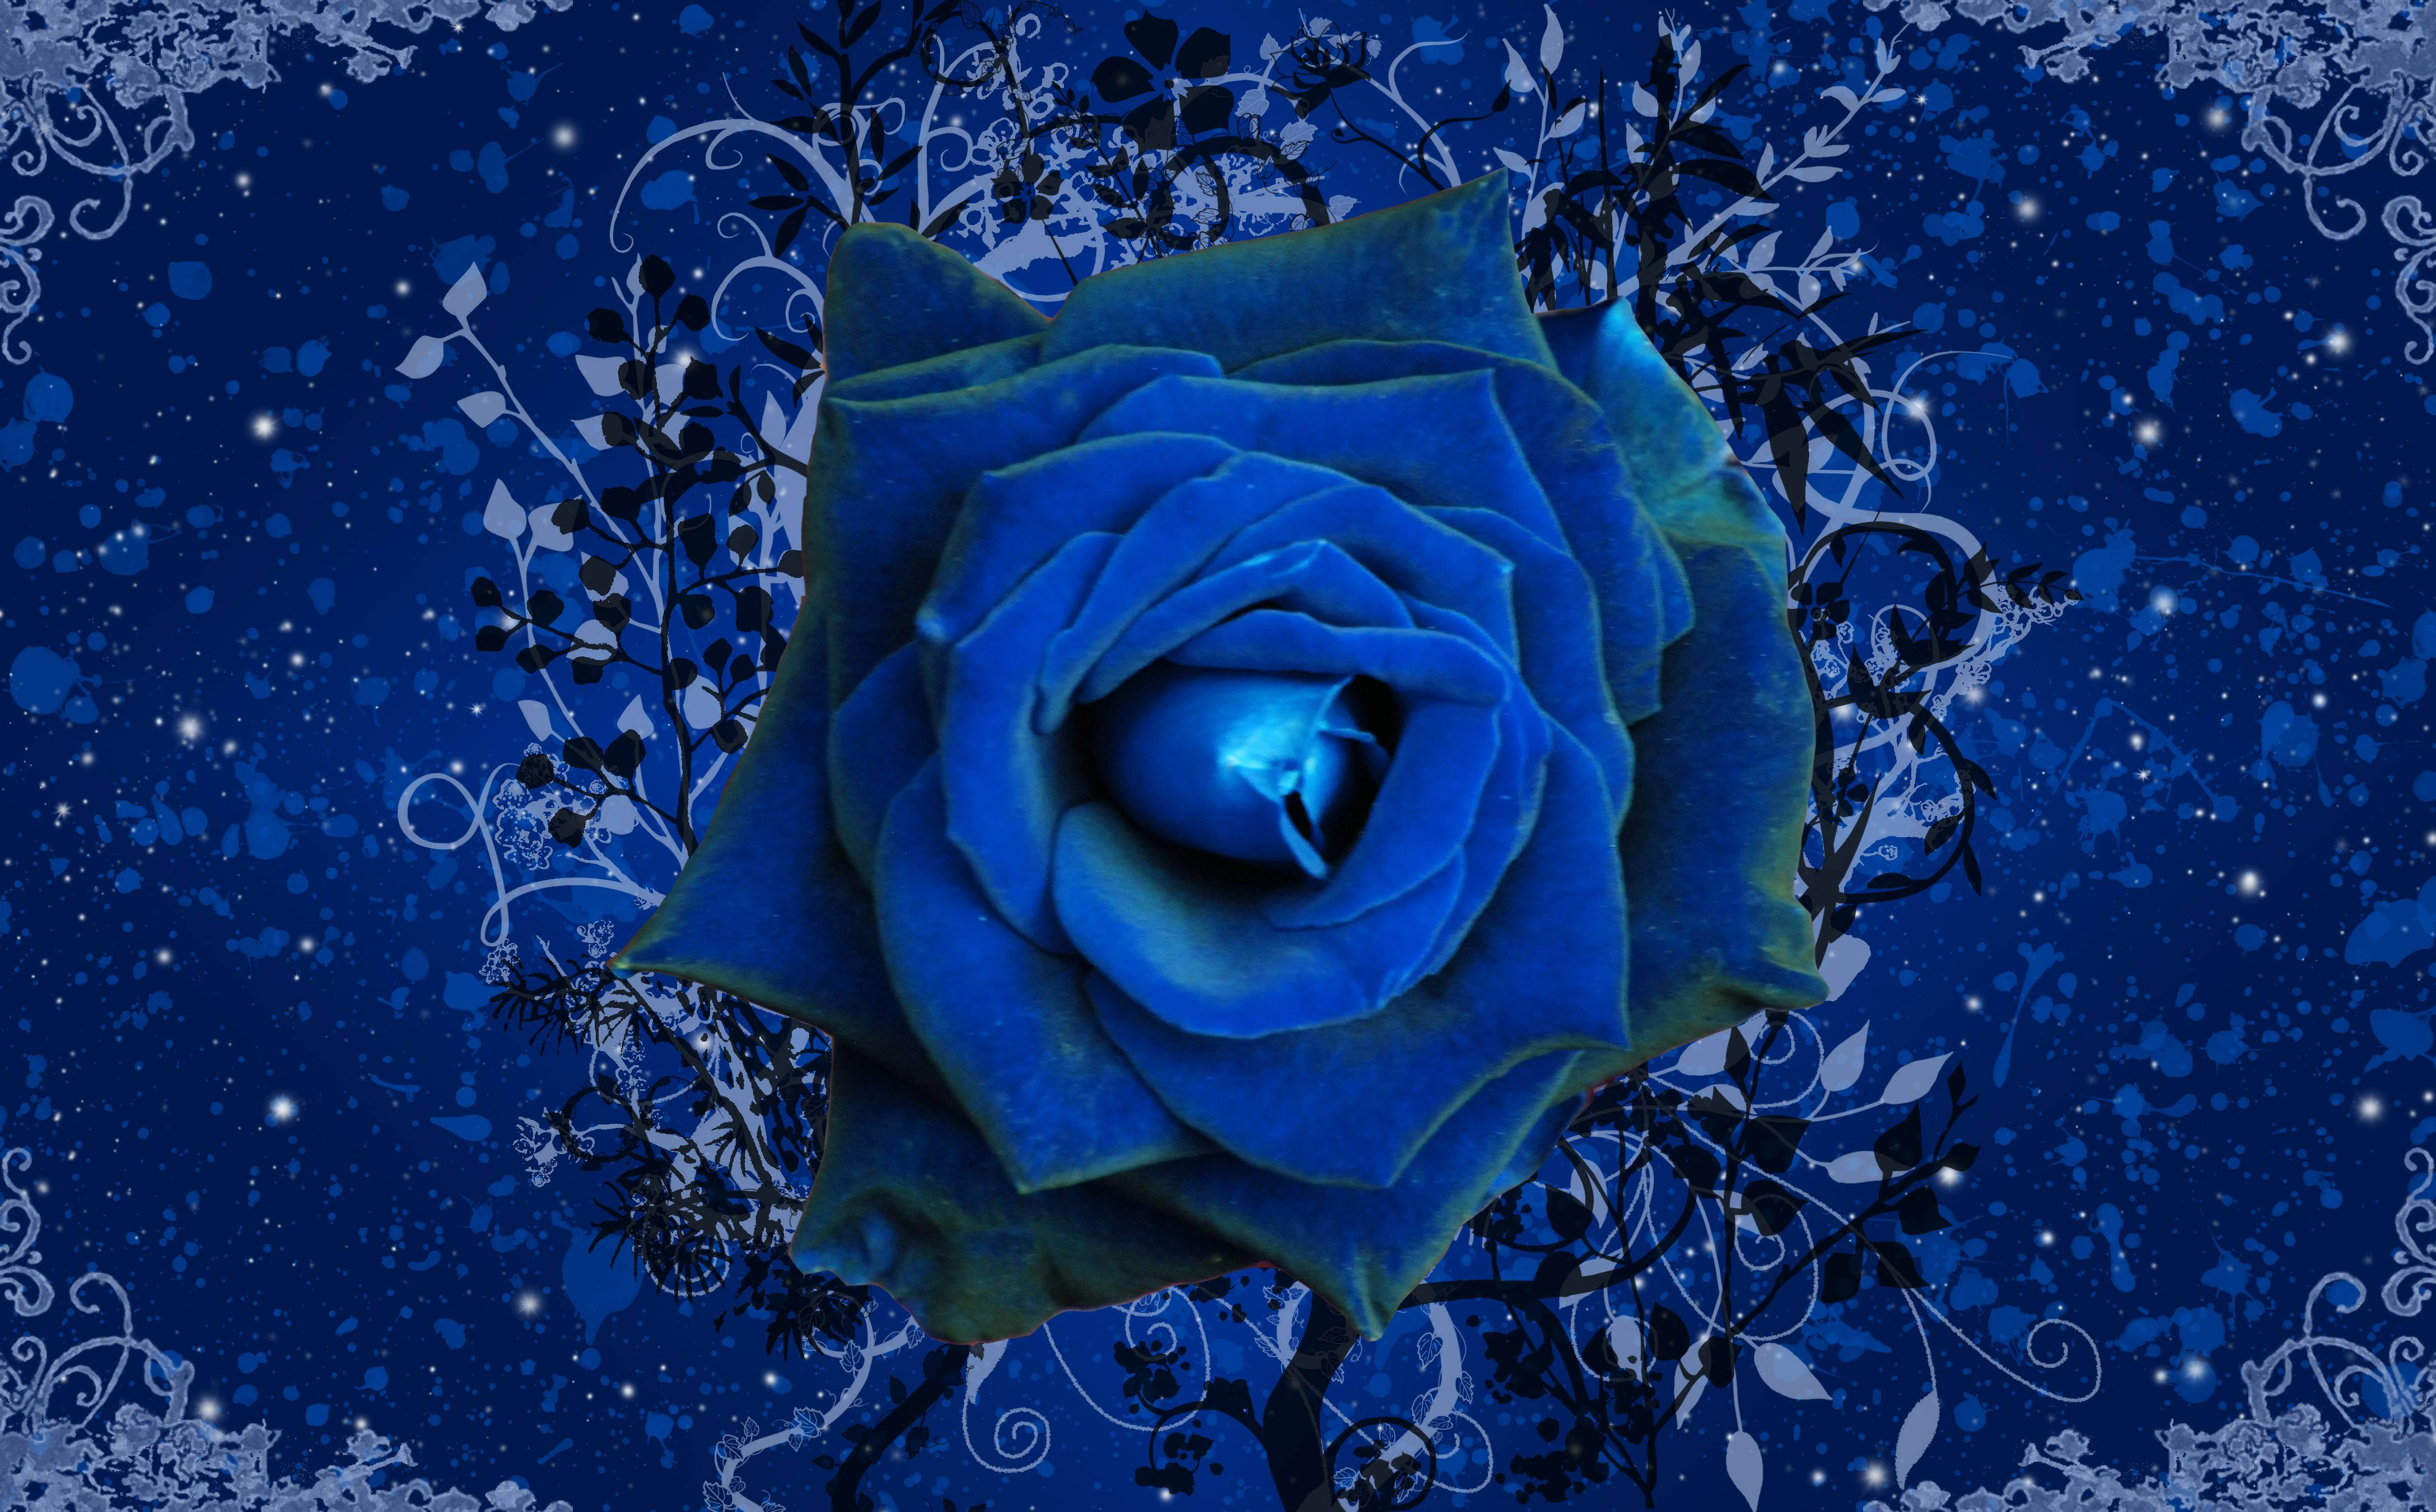 Blue-Rose- Wallpaper